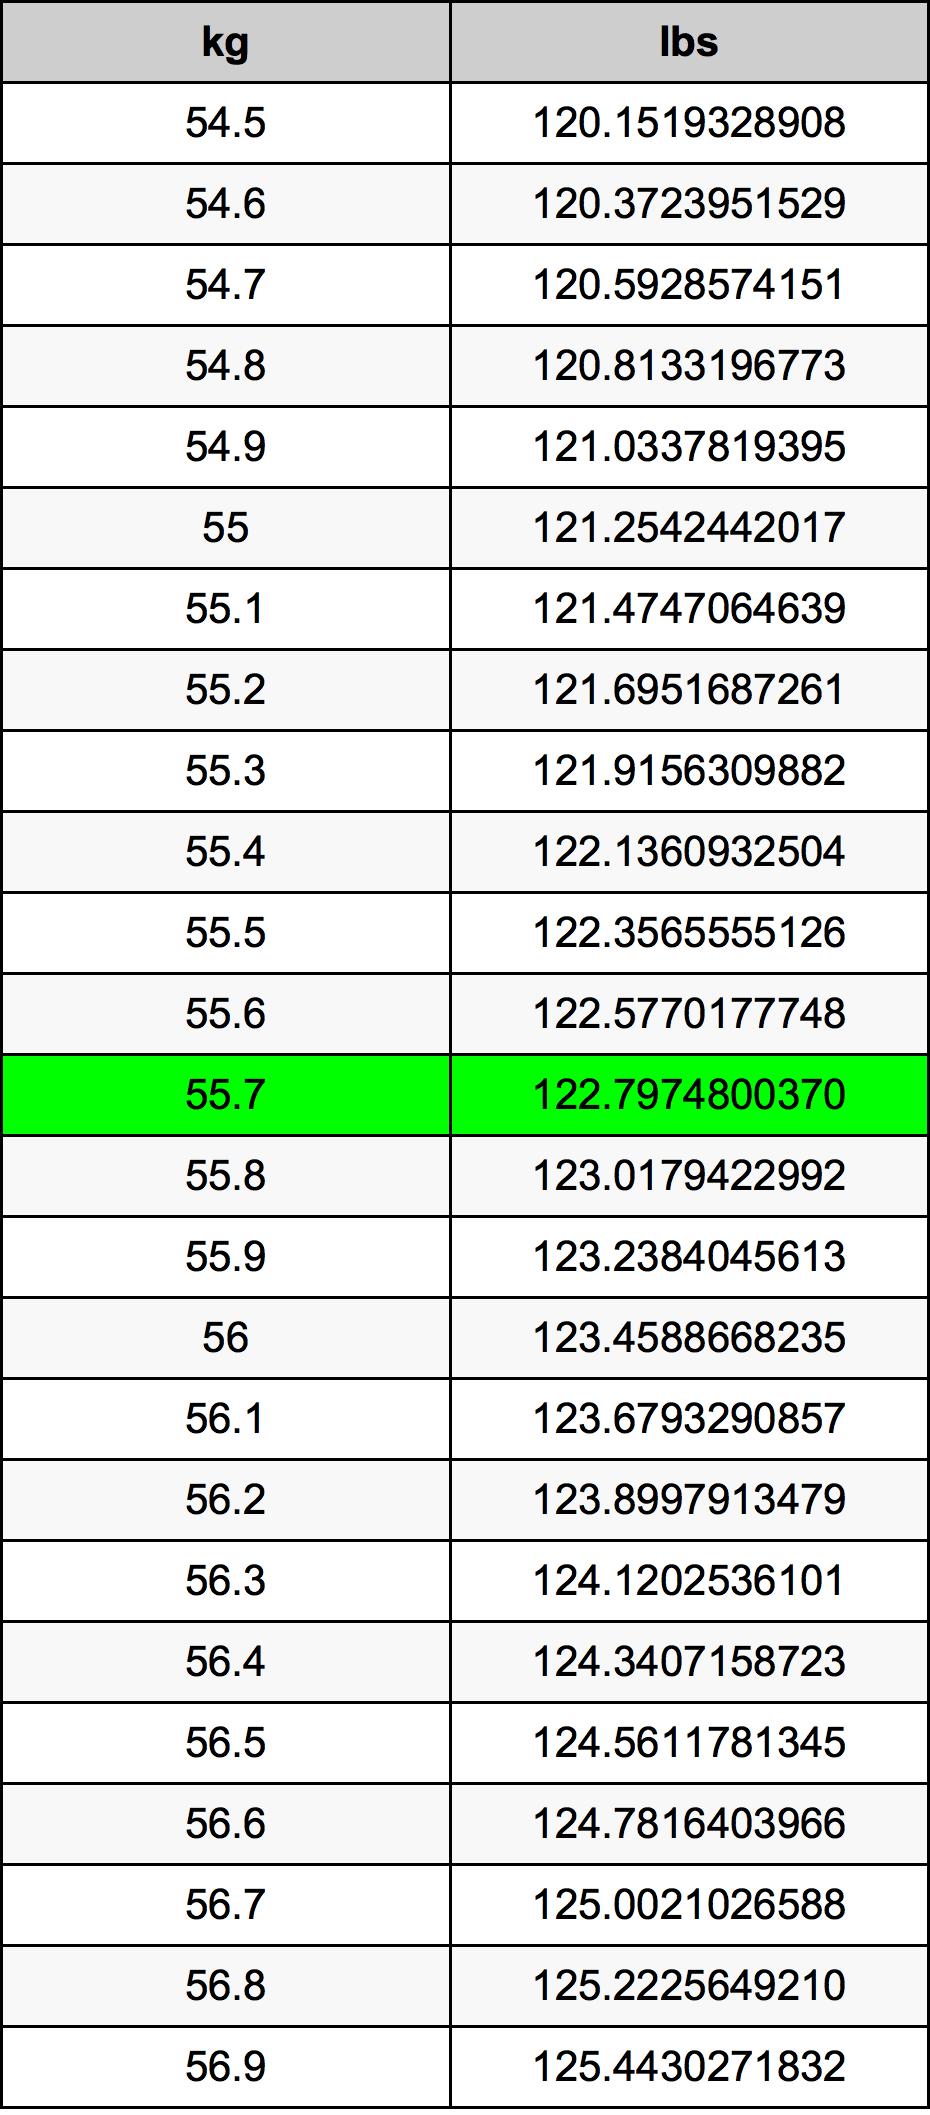 55.7 Kilogram tabelul de conversie